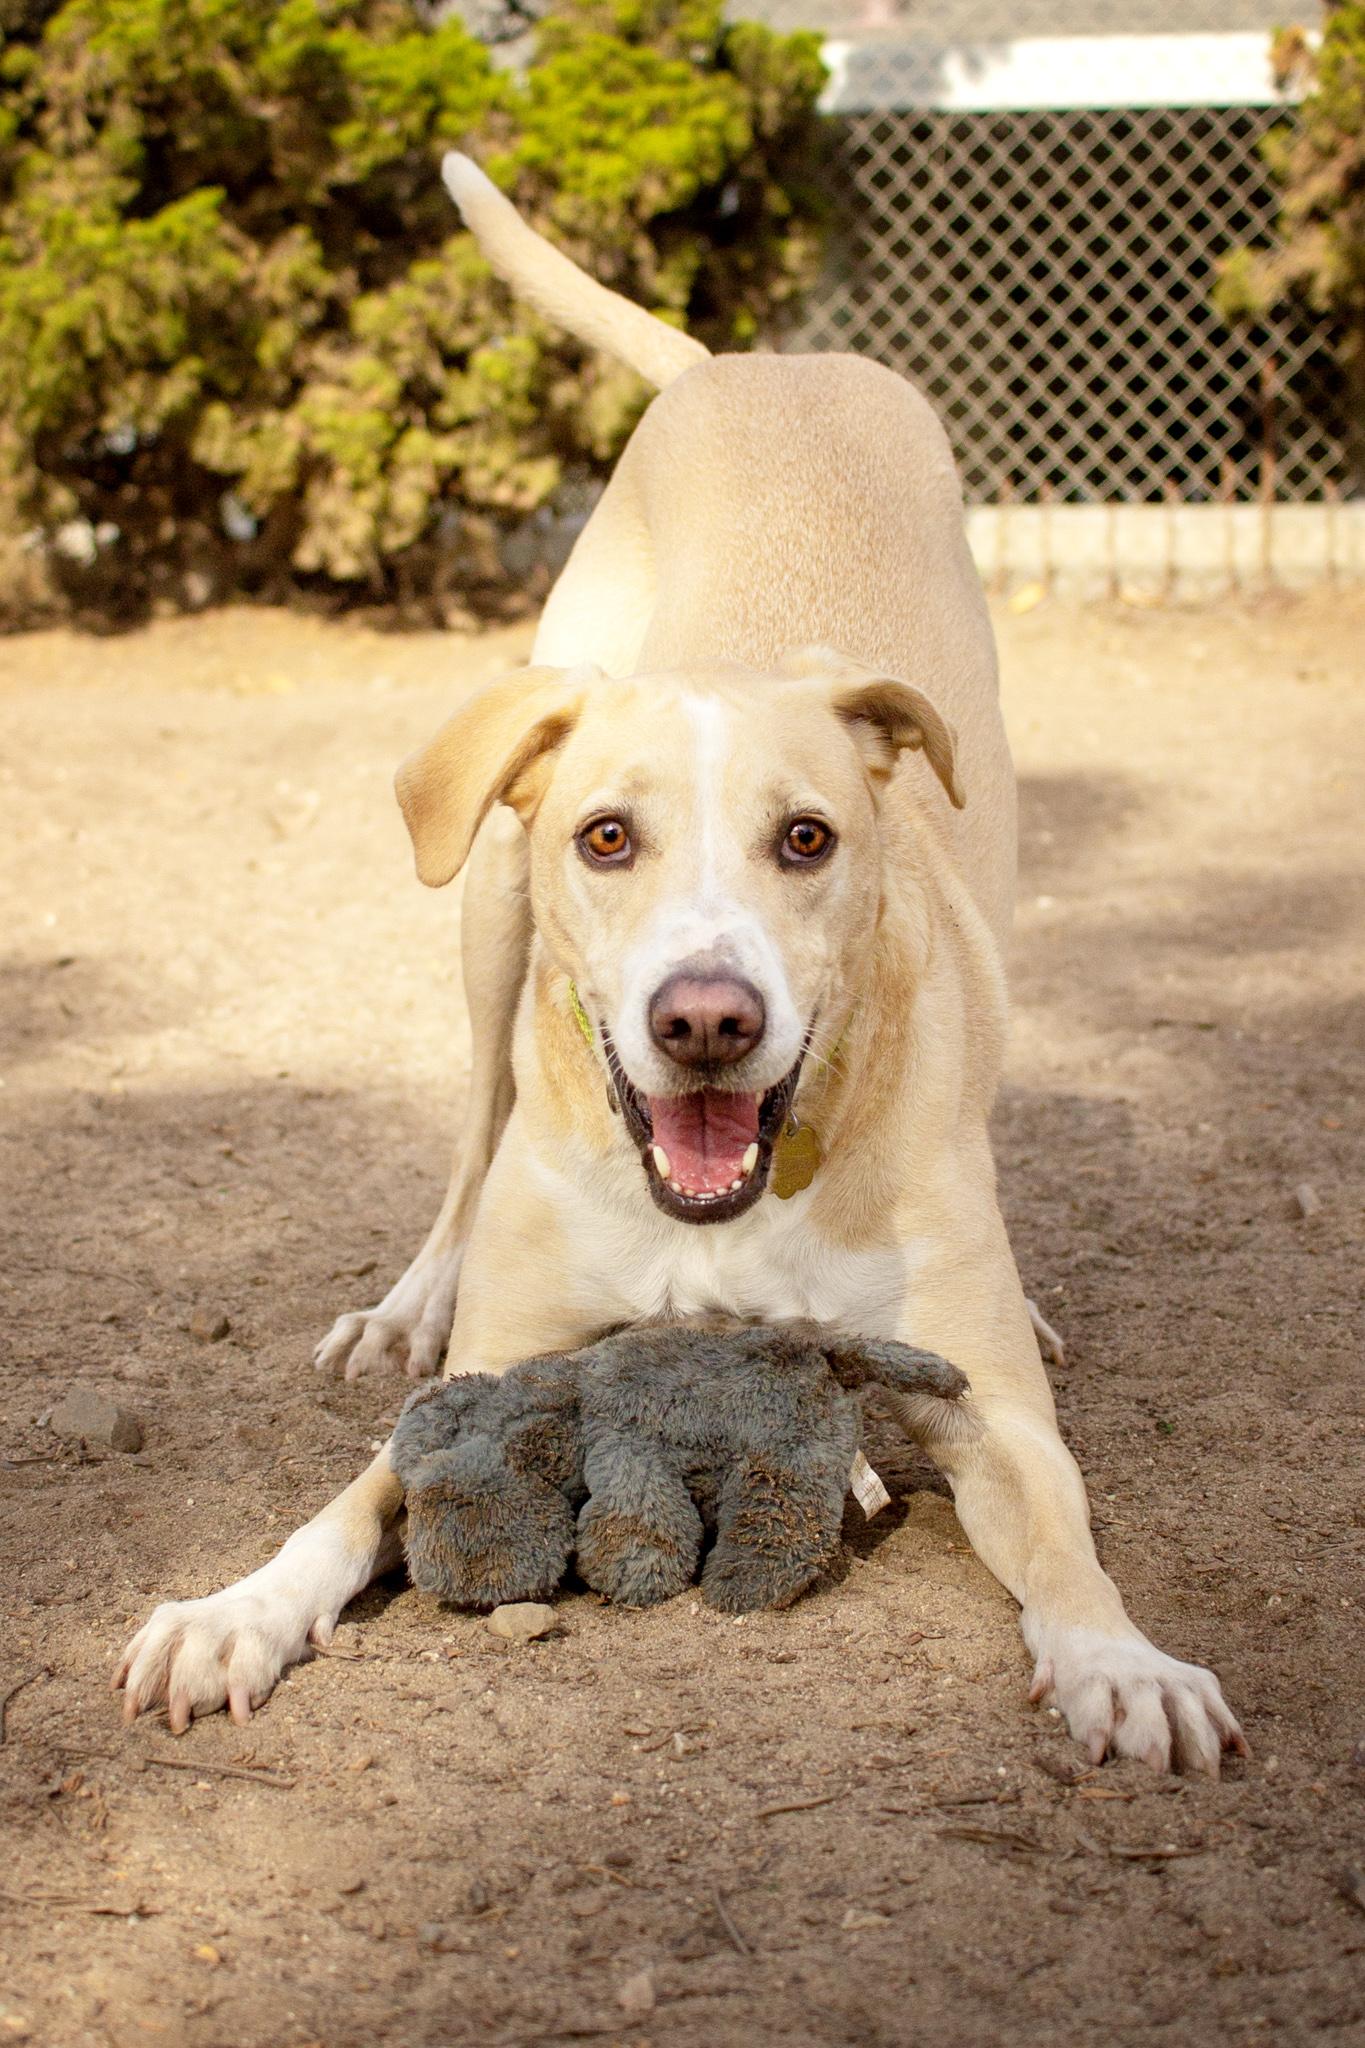 512-Orange-County-Dog-Photography-Steamer-Lee-Southern-California-SBACC.JPG